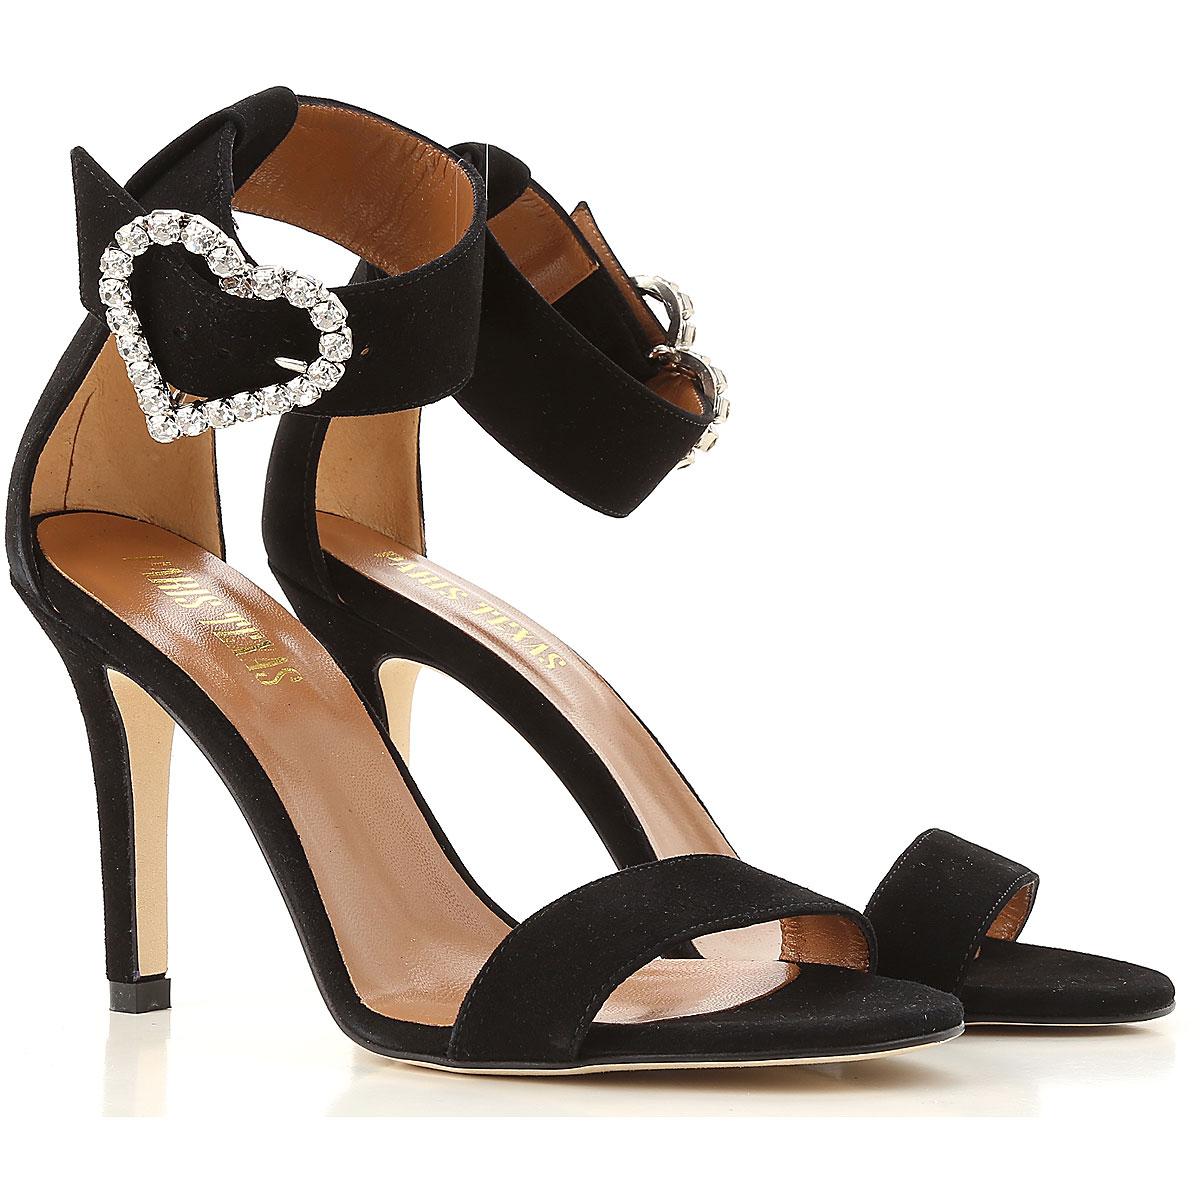 Image of Paris Texas Sandals for Women, Black, 2017, 10 11 6 7 8.5